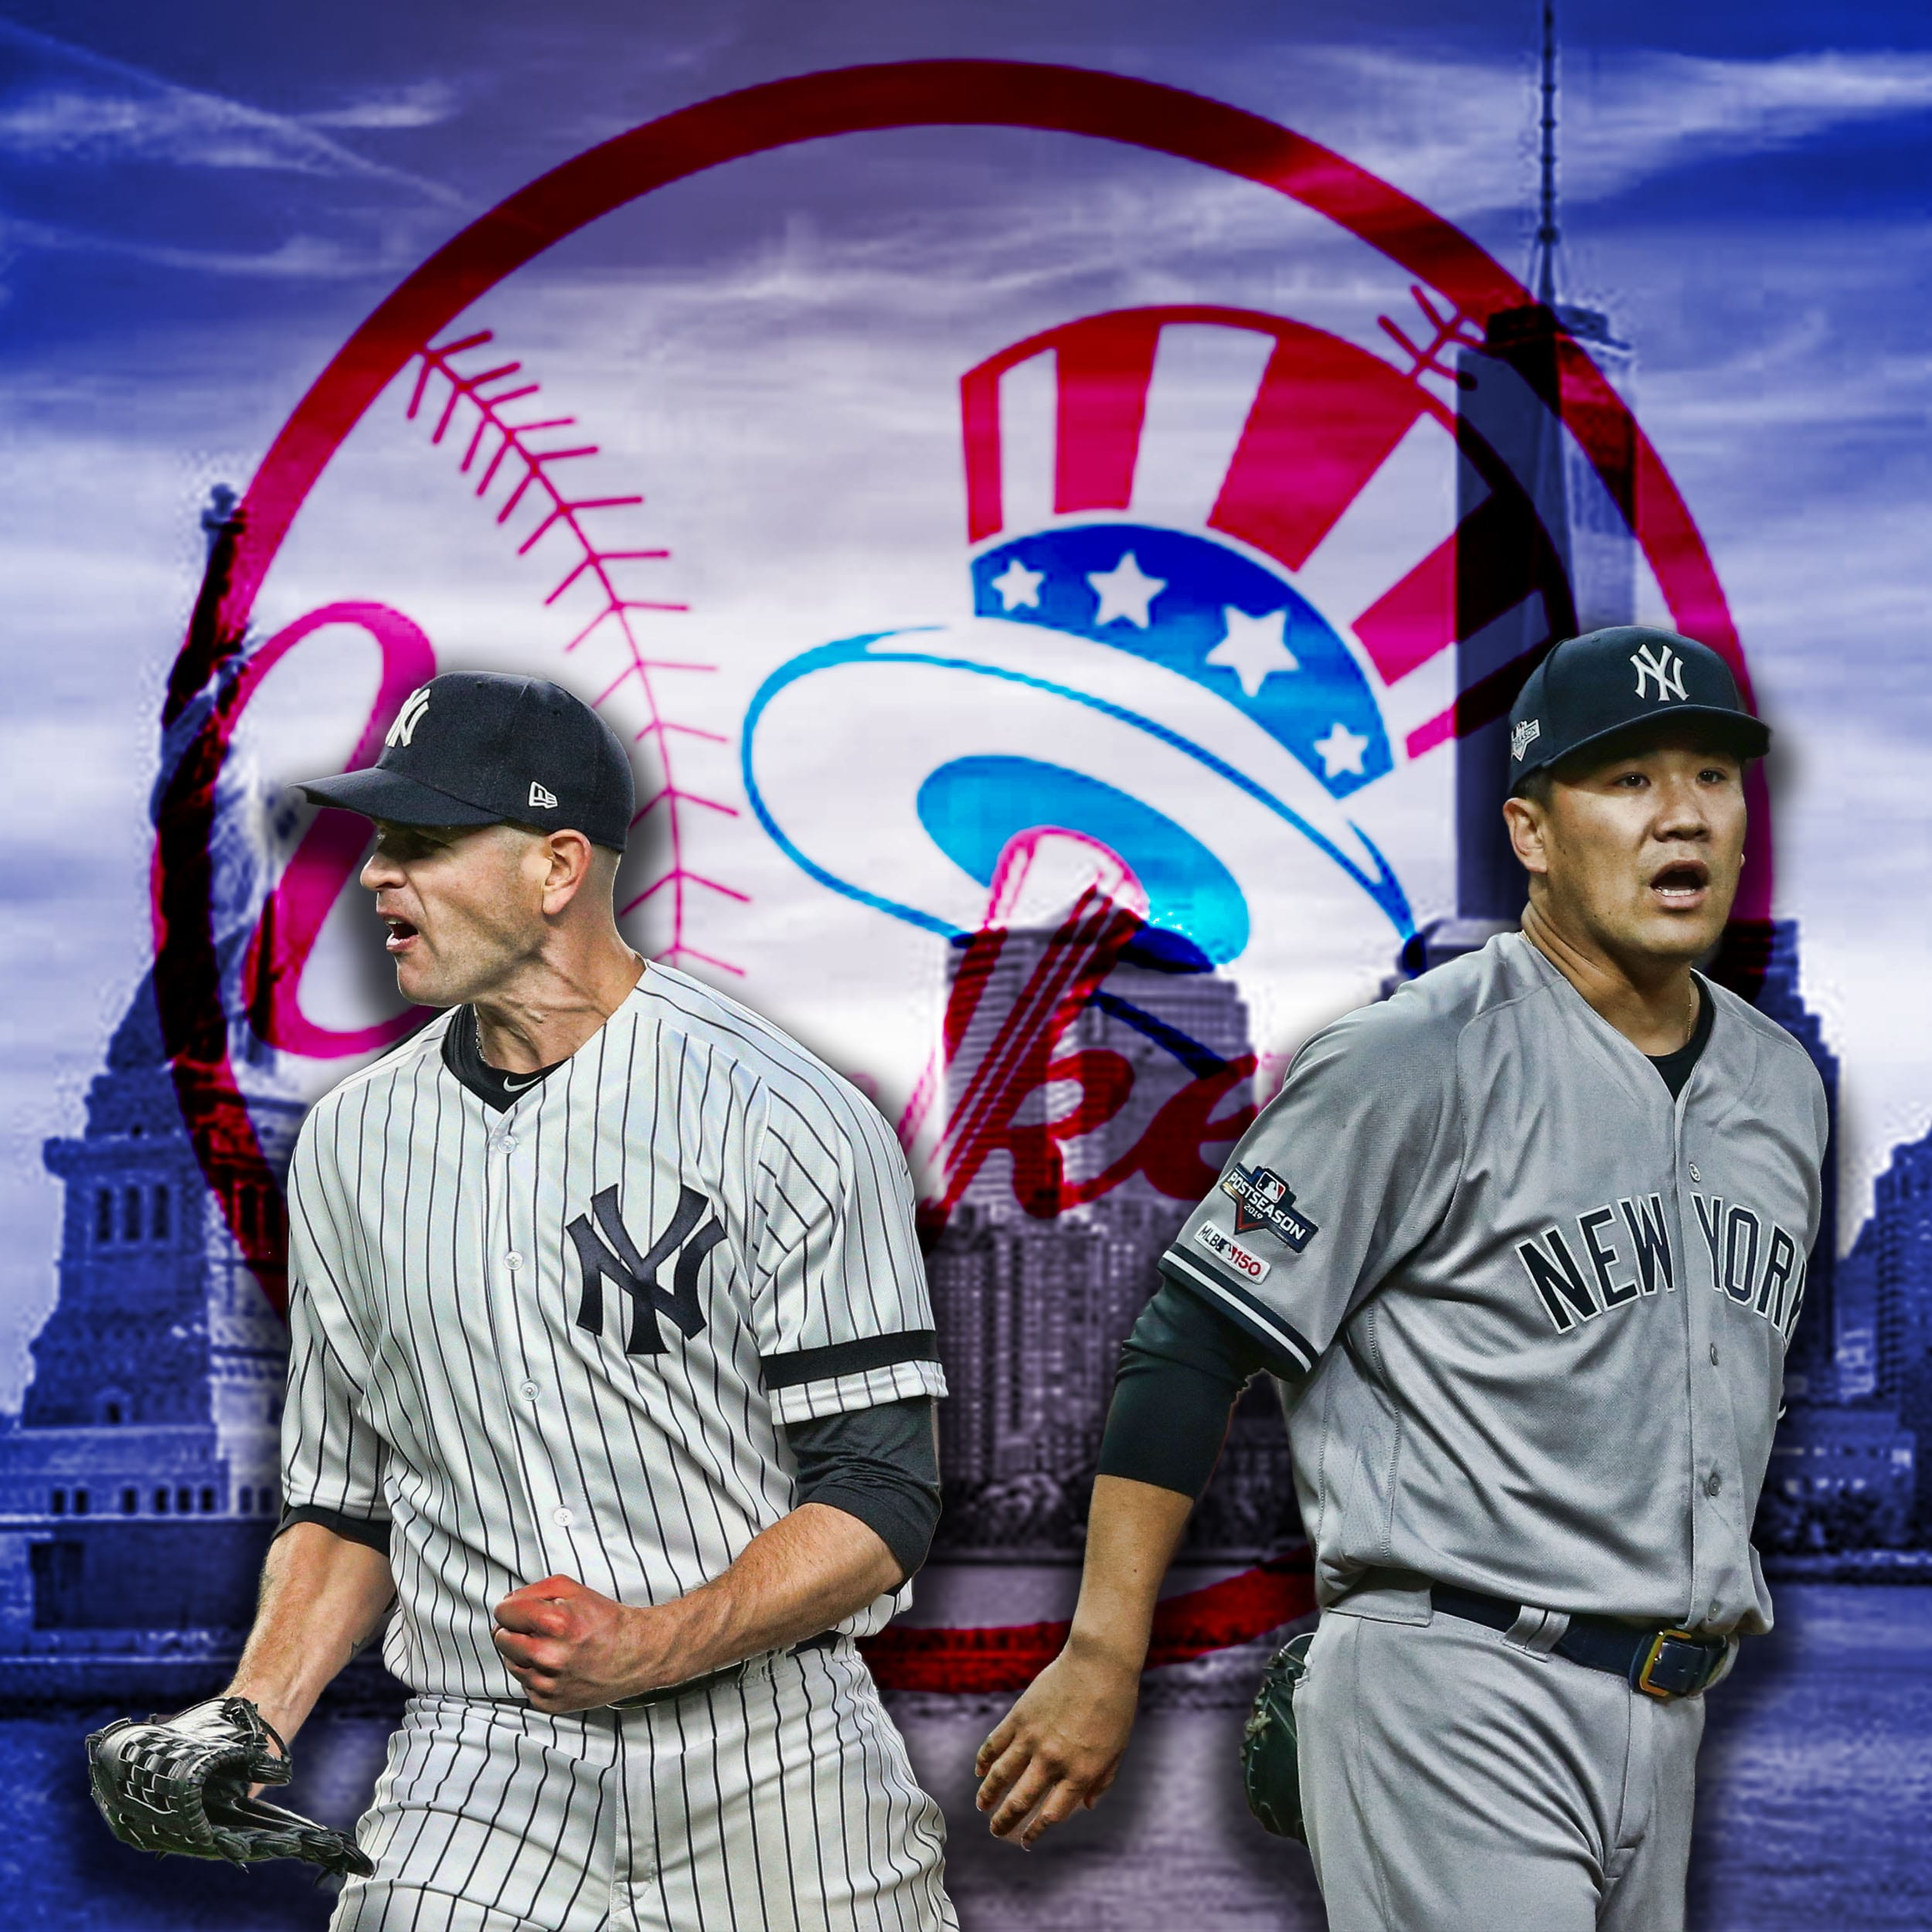 New York Yankees, James Paxton, Masahiro Tanaka